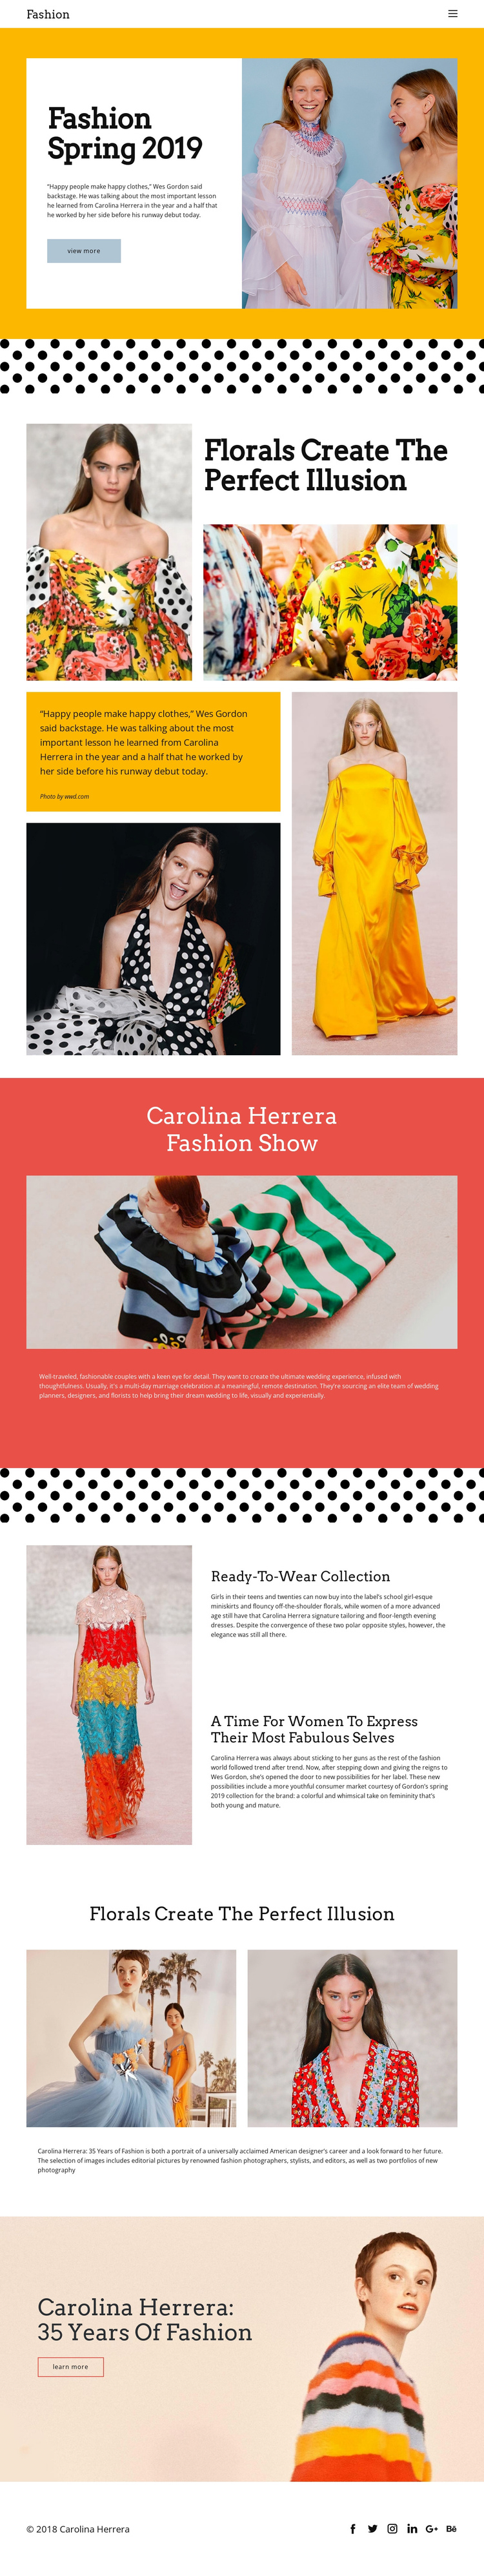 Fashion Spring Website Builder Software